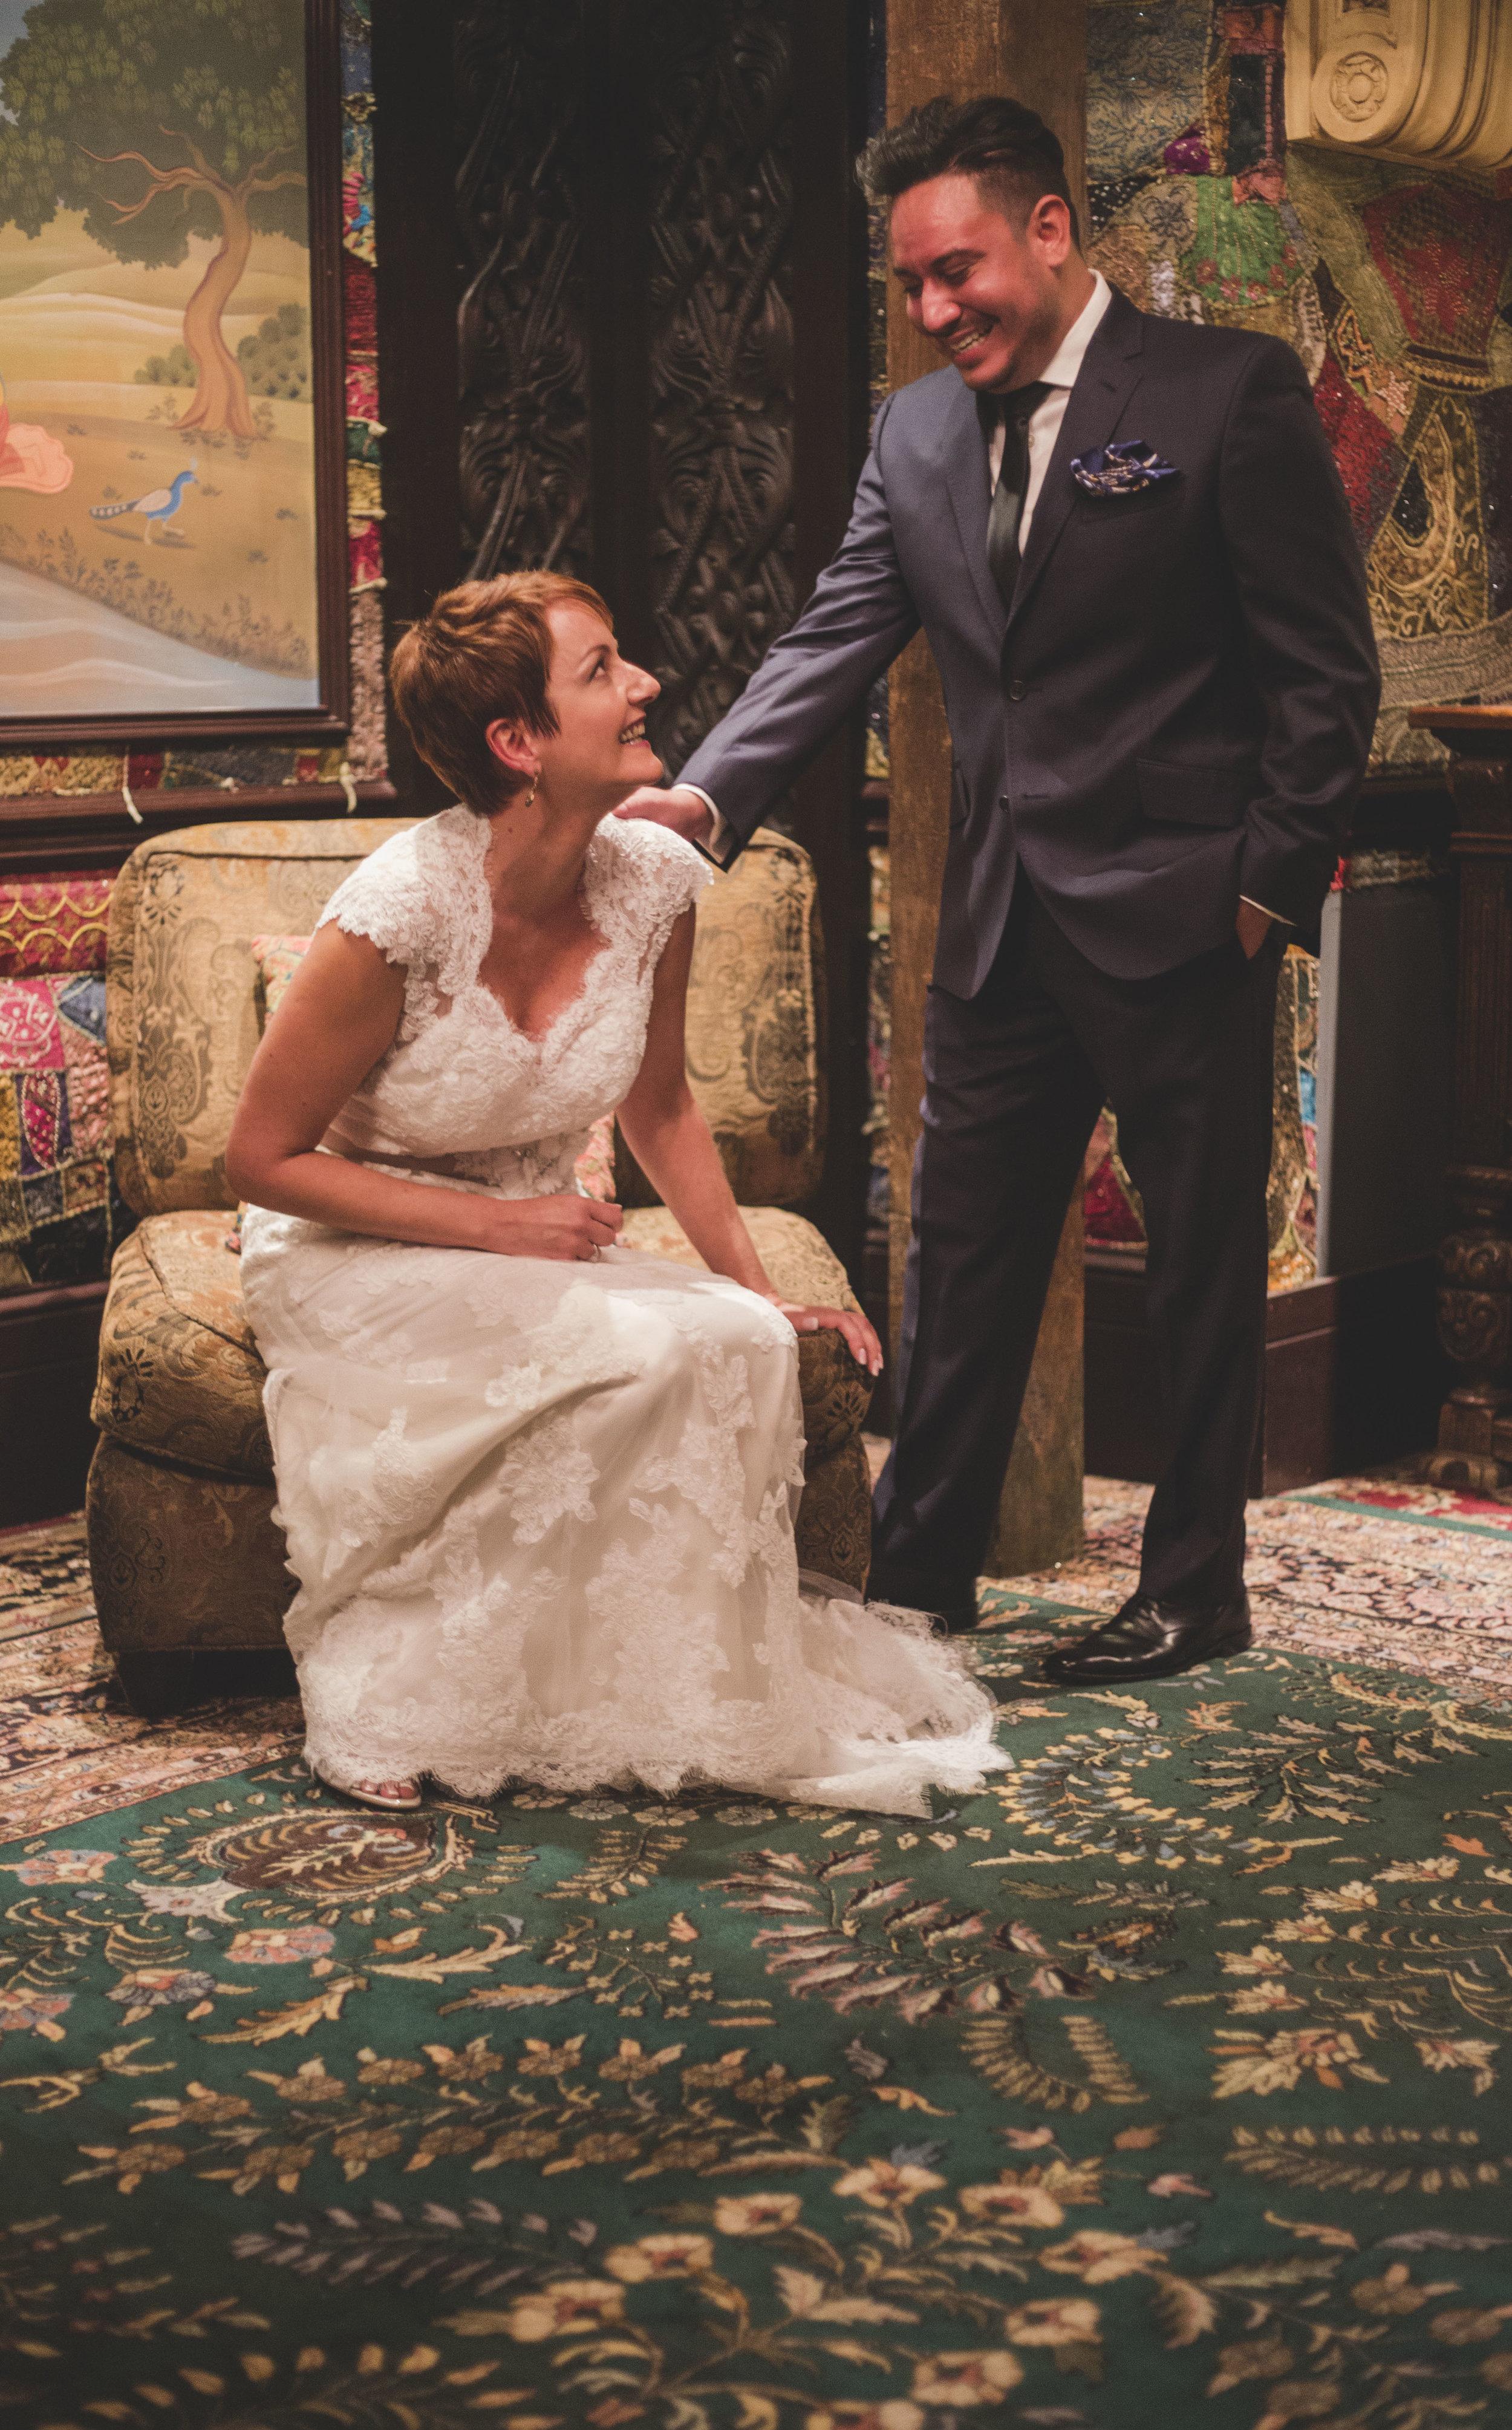 ATGI_Kat and Gabe Wedding 2016_2S8A5224.jpg